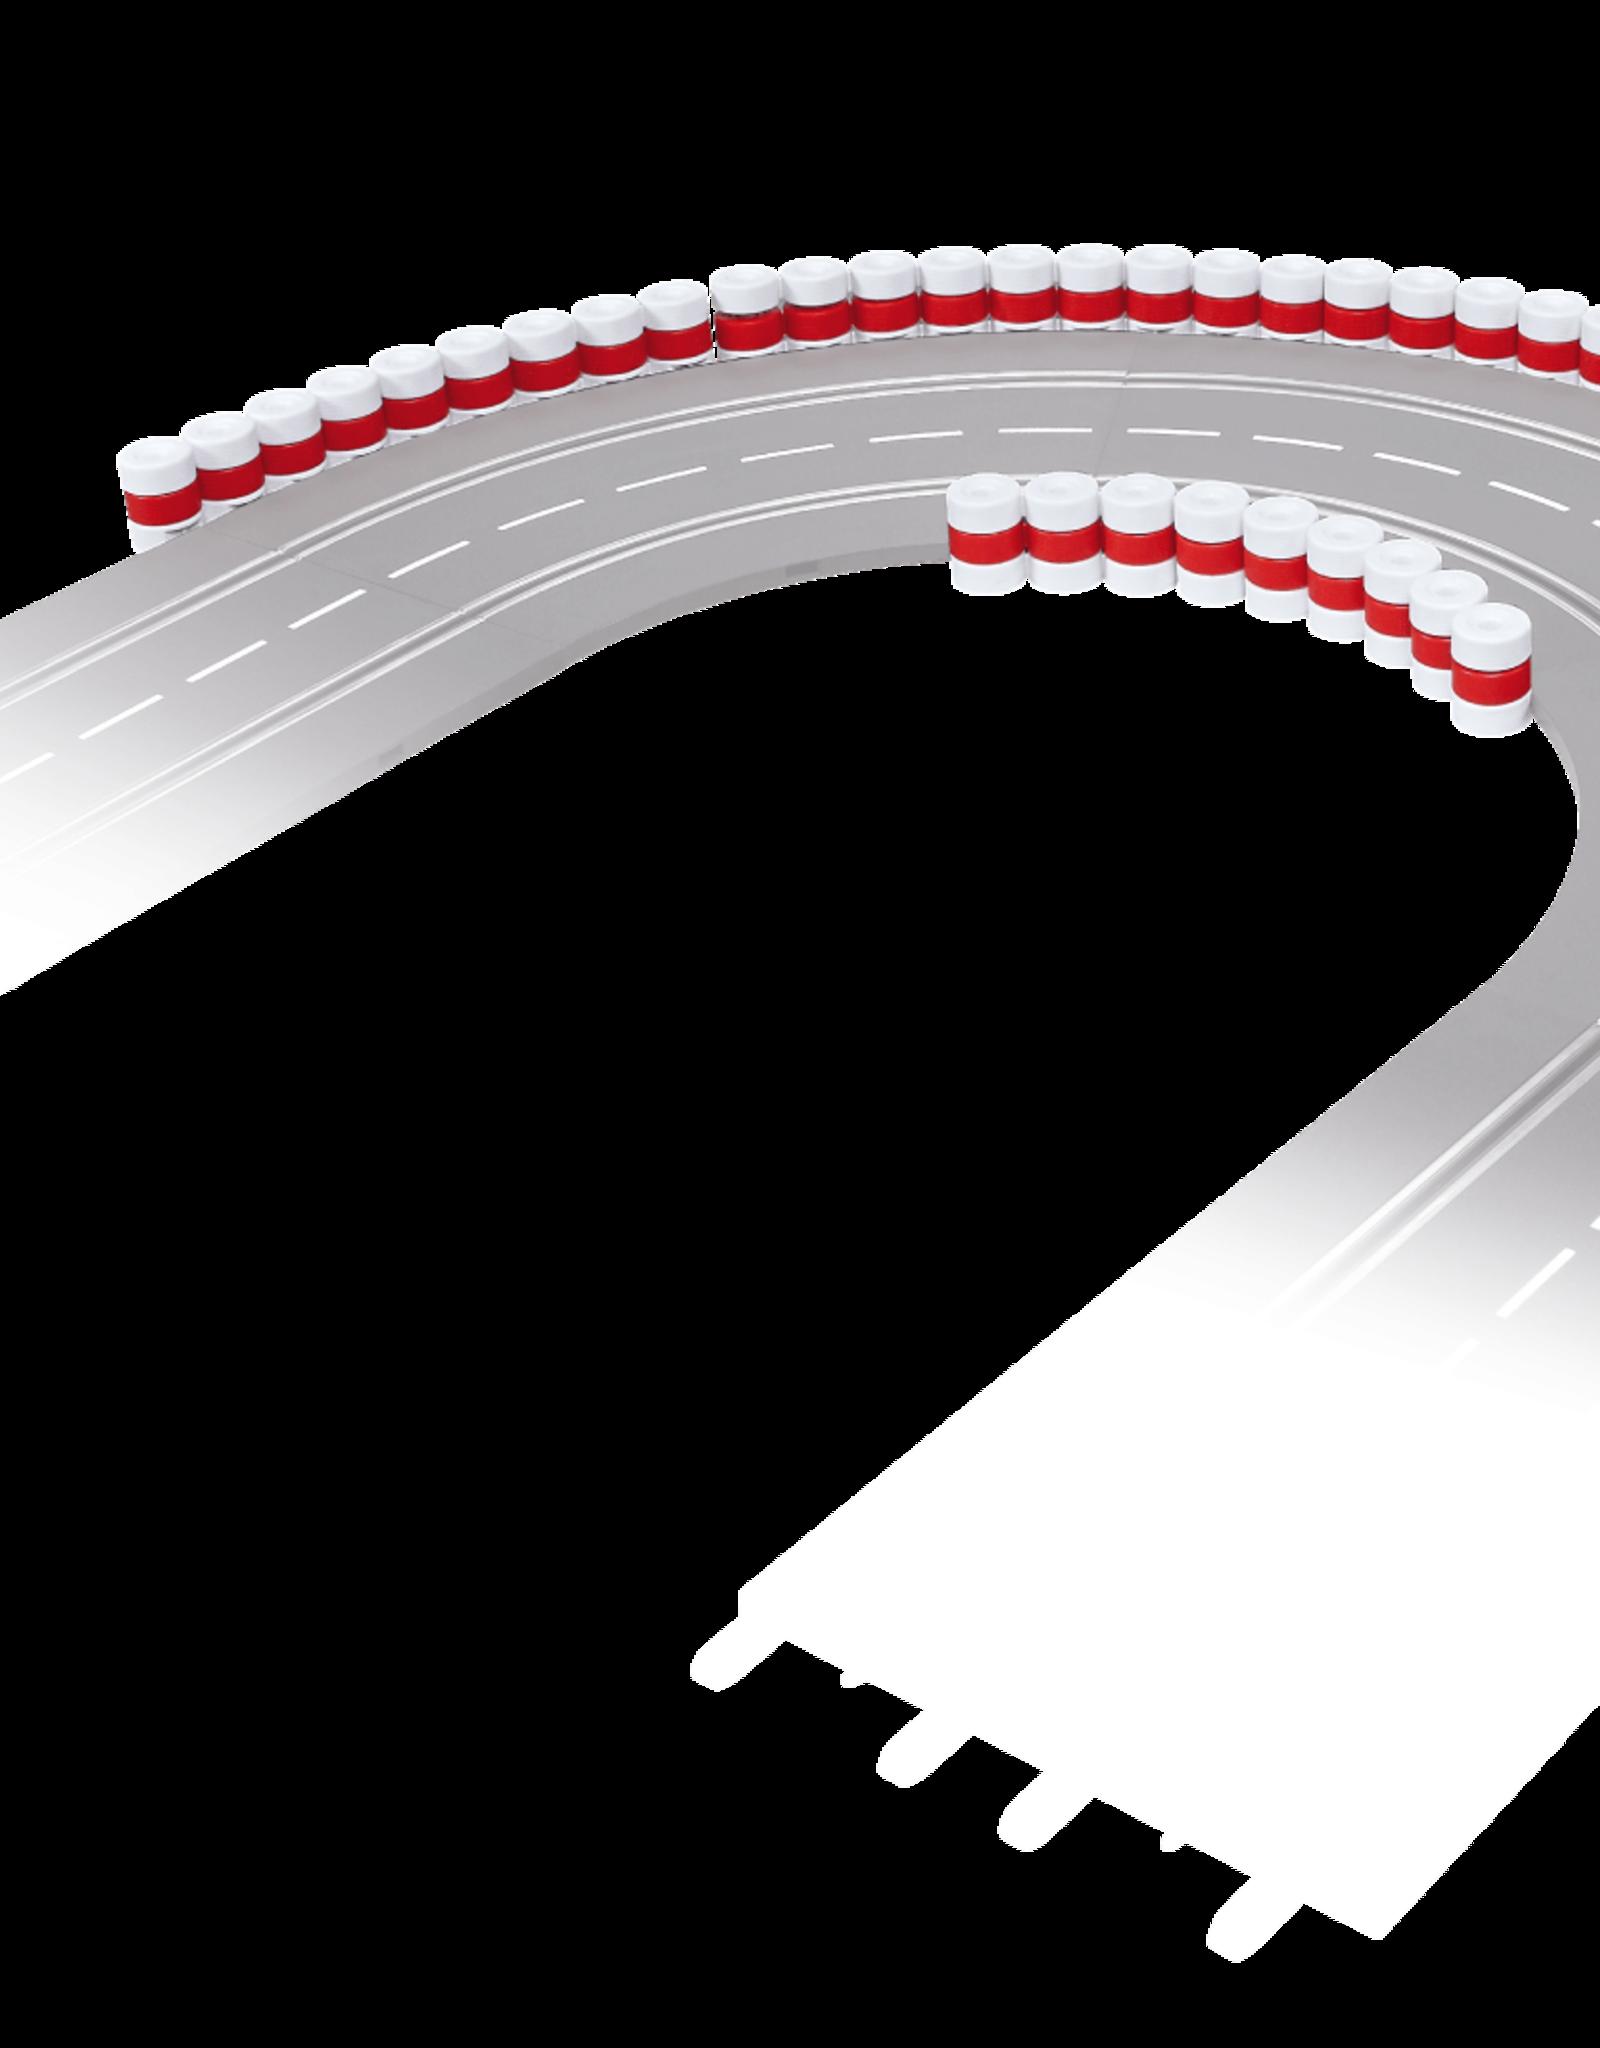 carrera CAR21130 Stack of Tyres